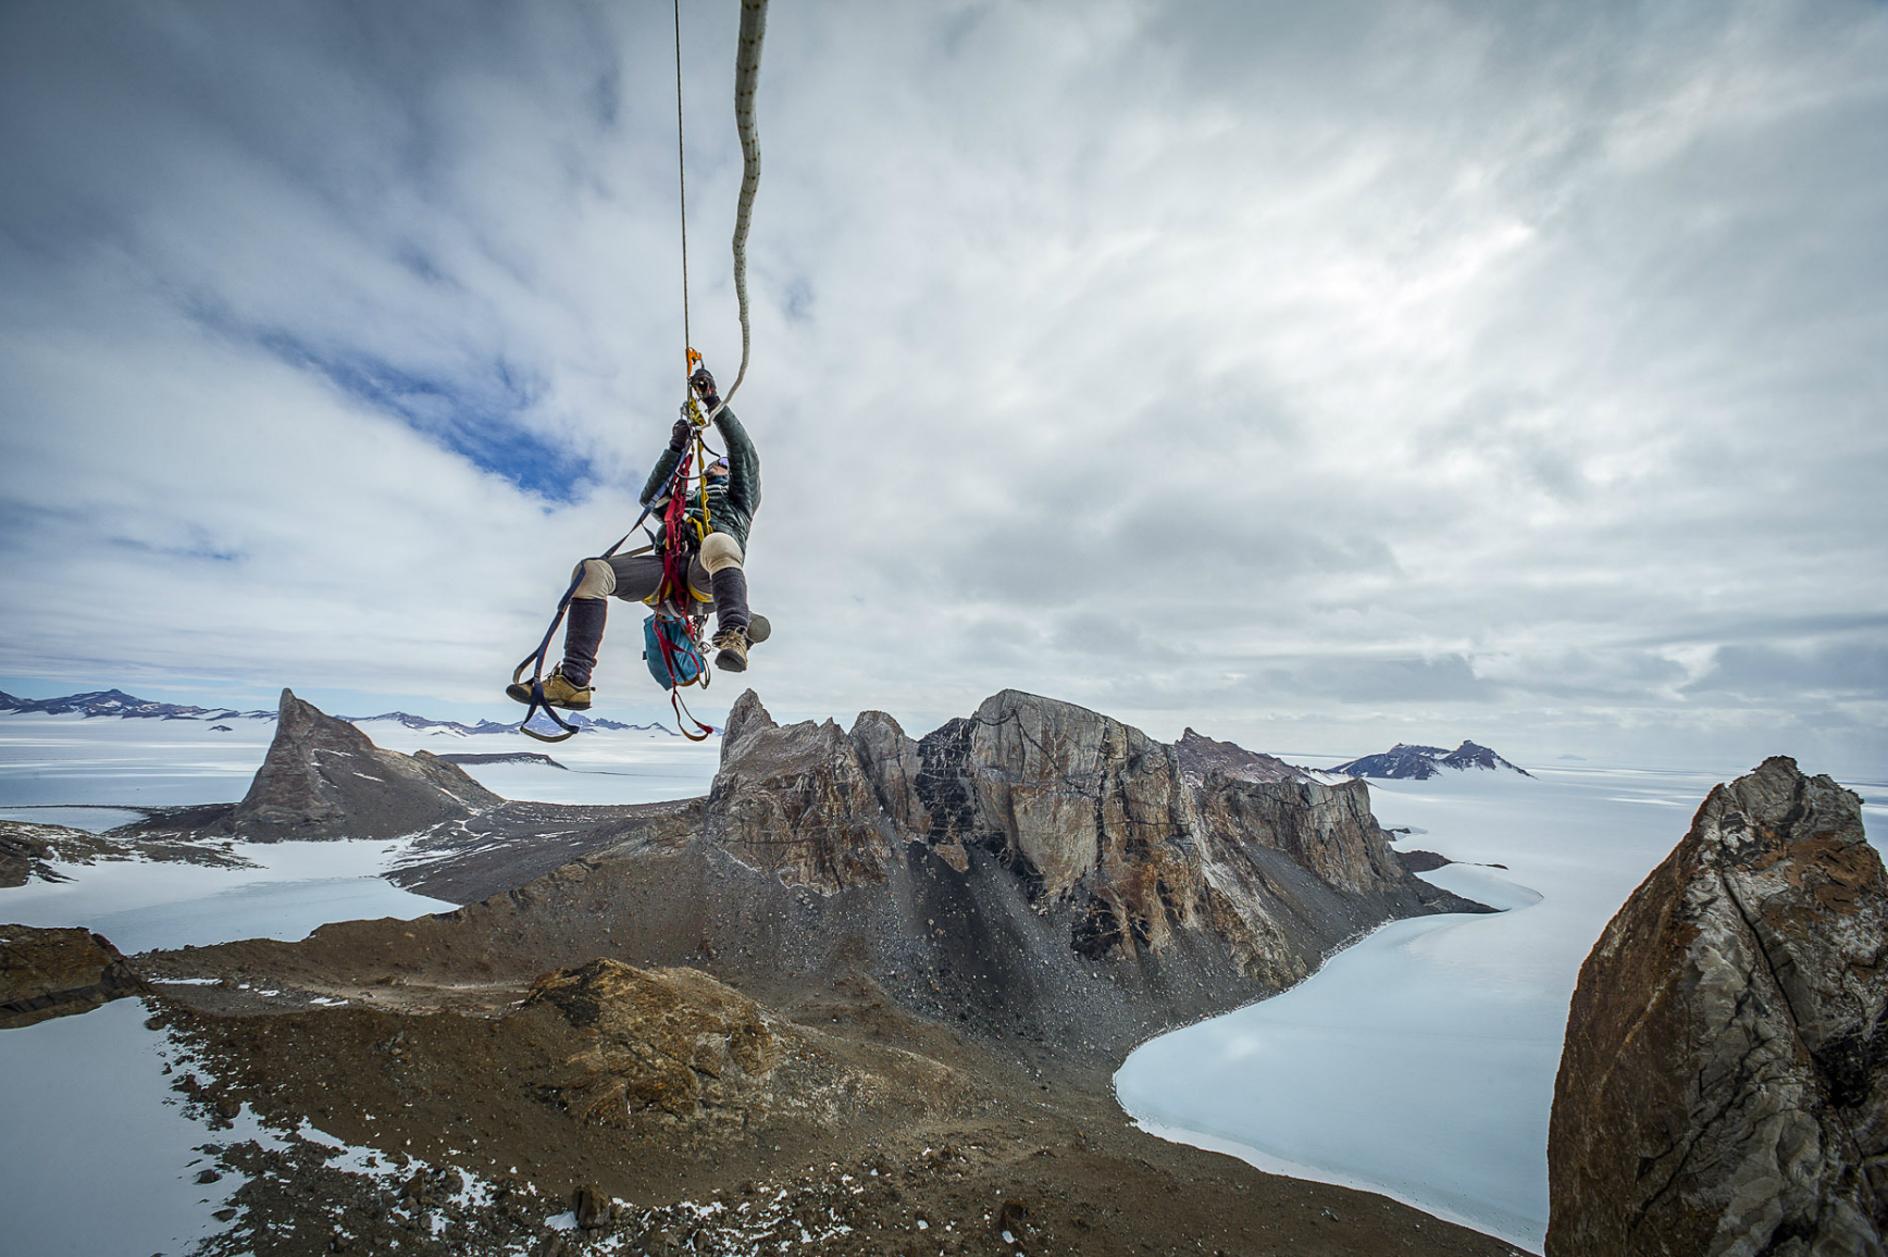 Cory-Richards-Photographer-Antarctica-16.jpg